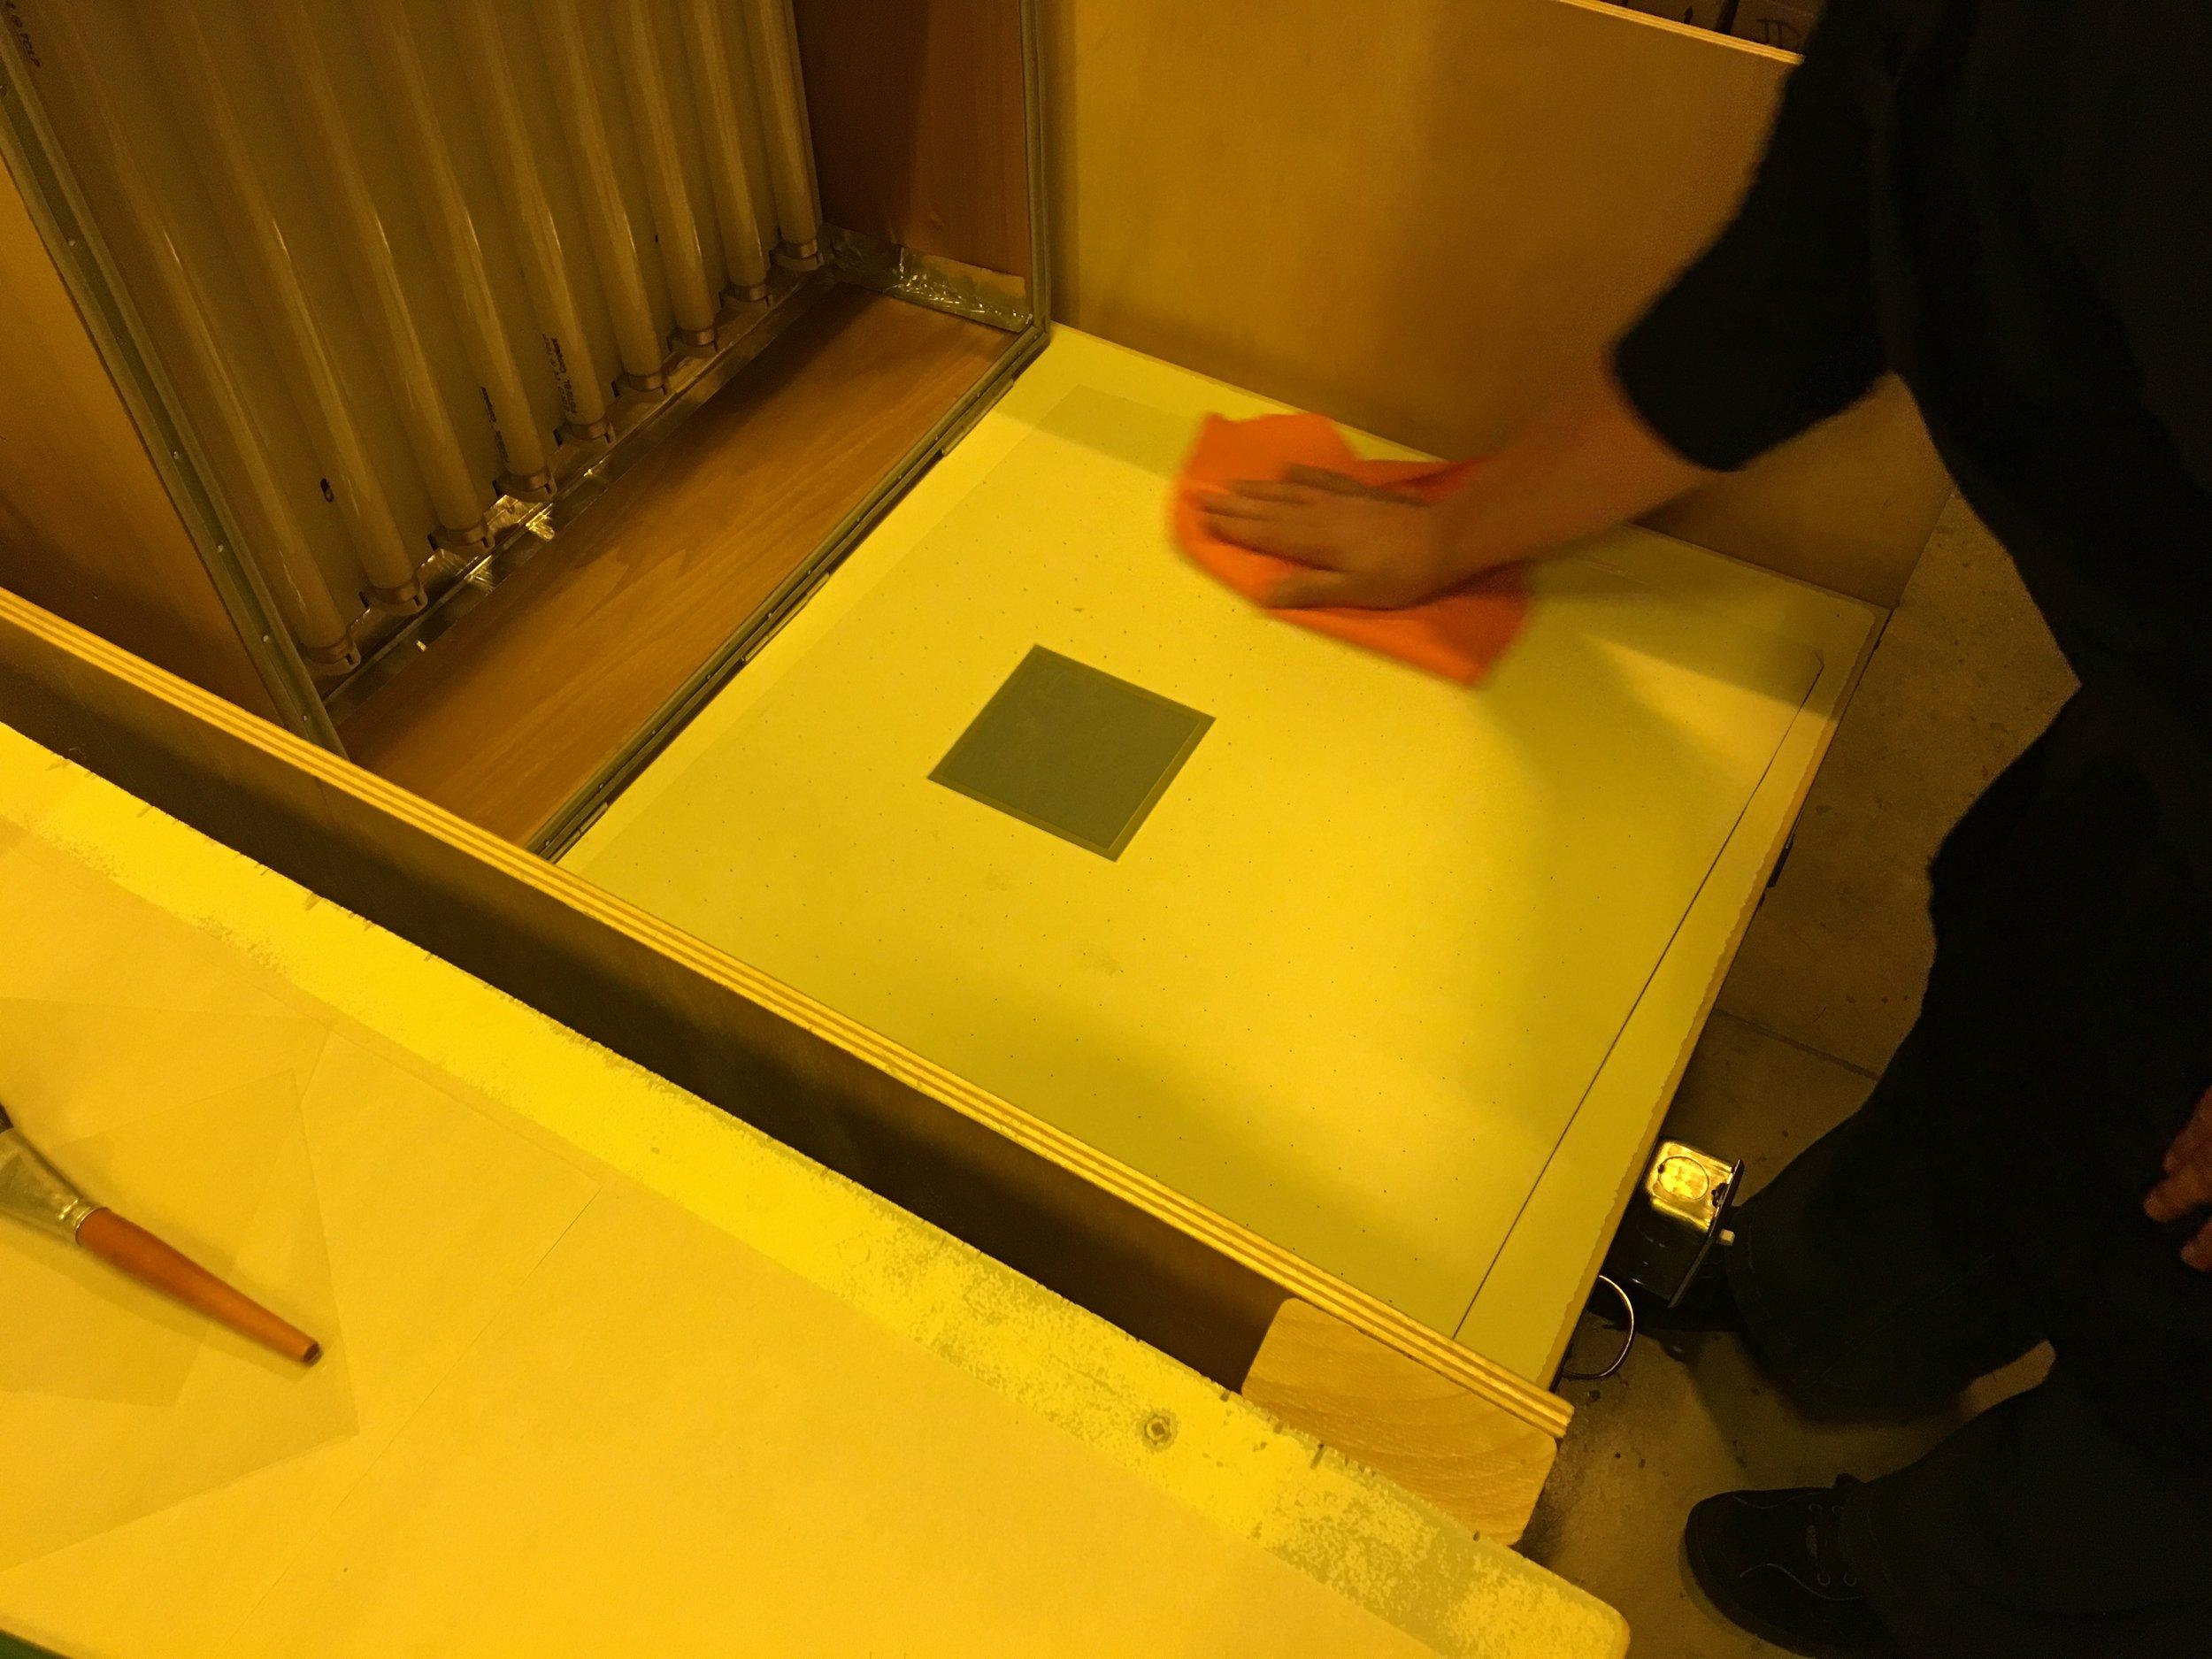 Polymergravure exposure unit